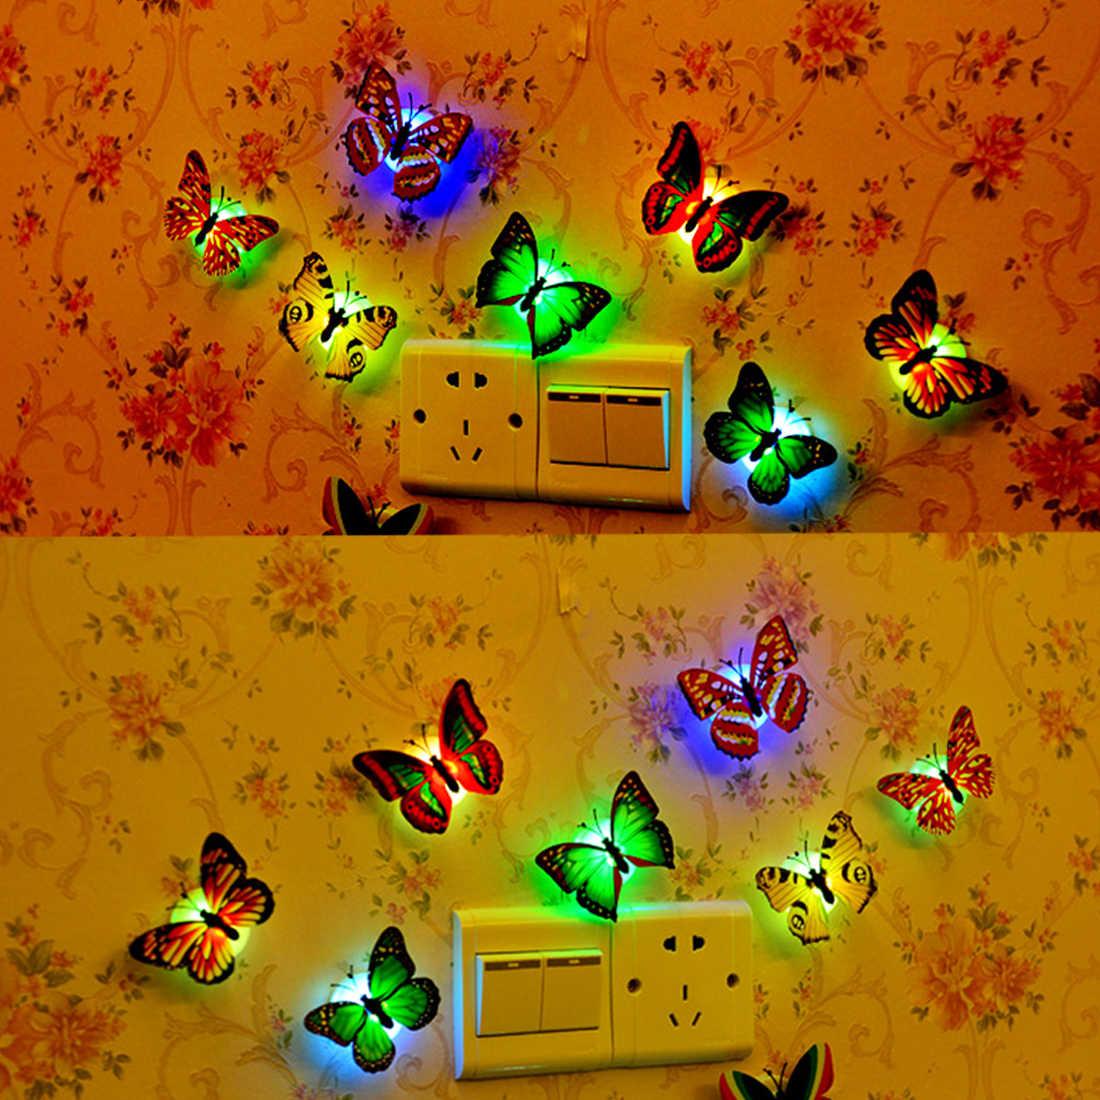 1 stks Mooie Creatieve Kleurrijke Vlinder LED Nachtlampje Mooie Thuis Slaapkamer Decoratieve Muur Nachtverlichting Kleur Willekeurige